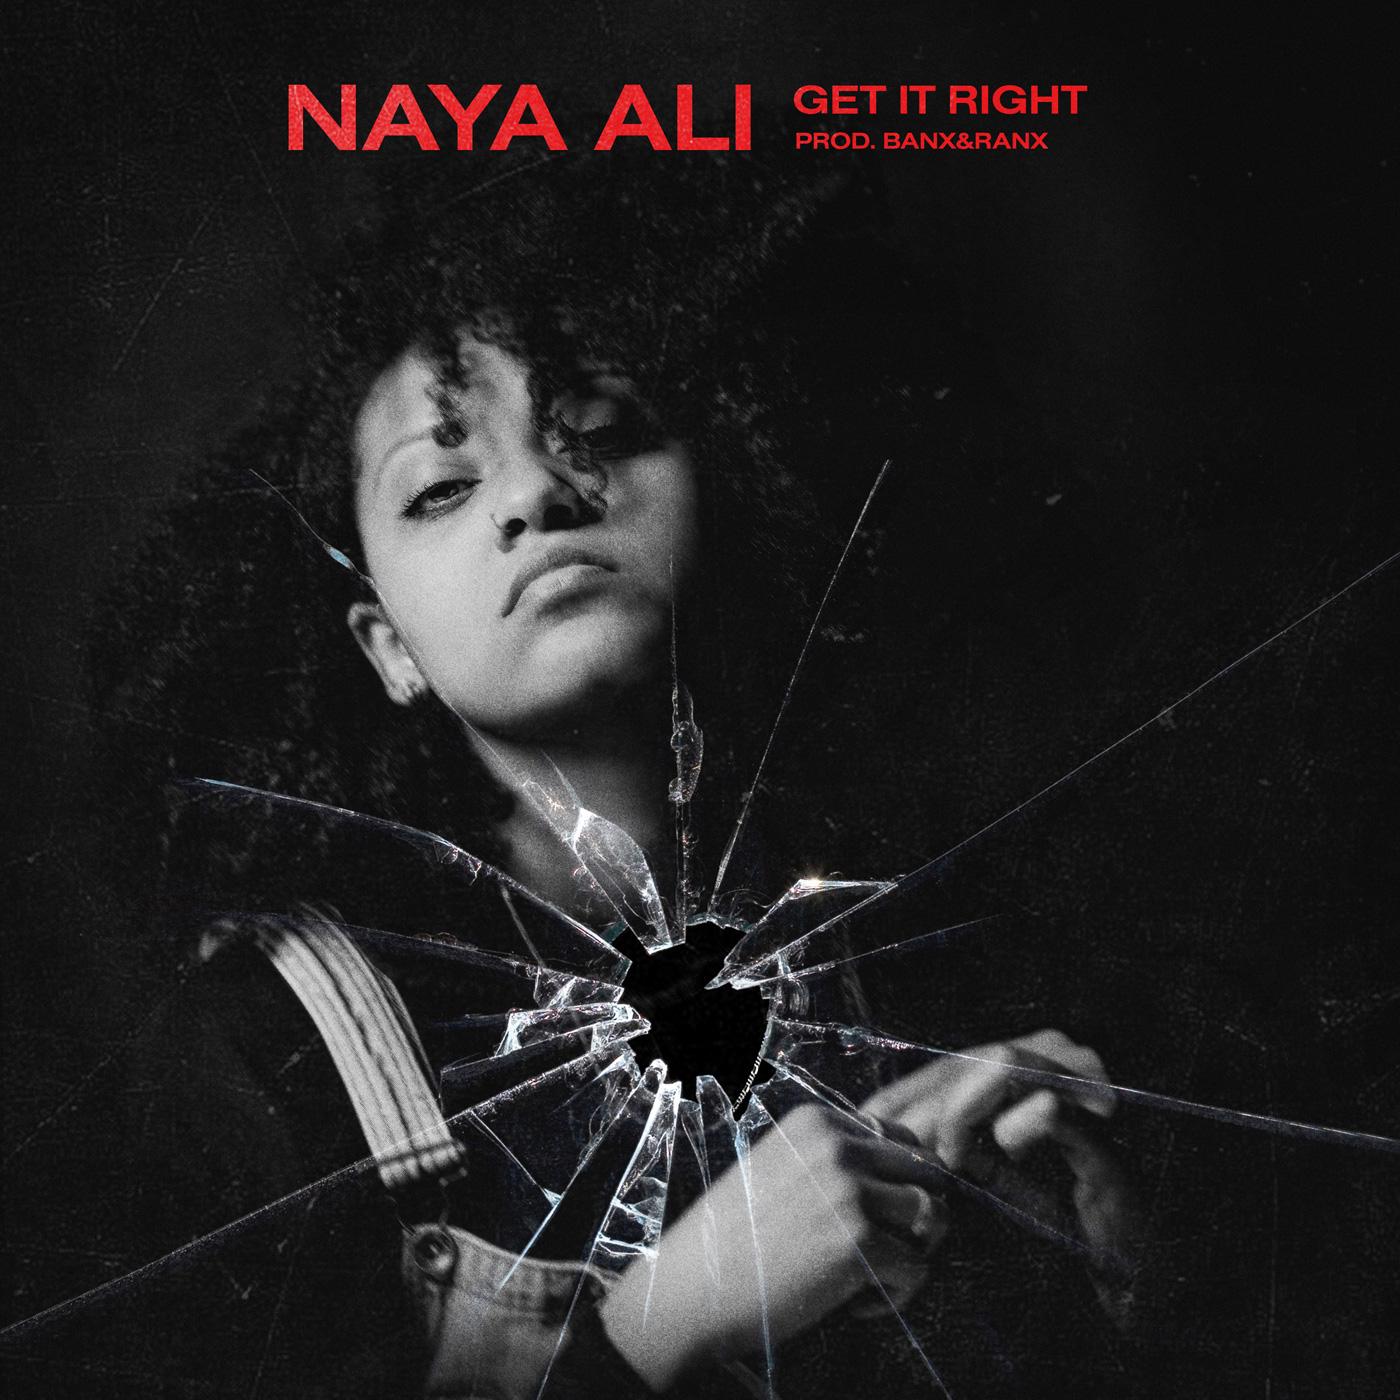 naya ali cover art